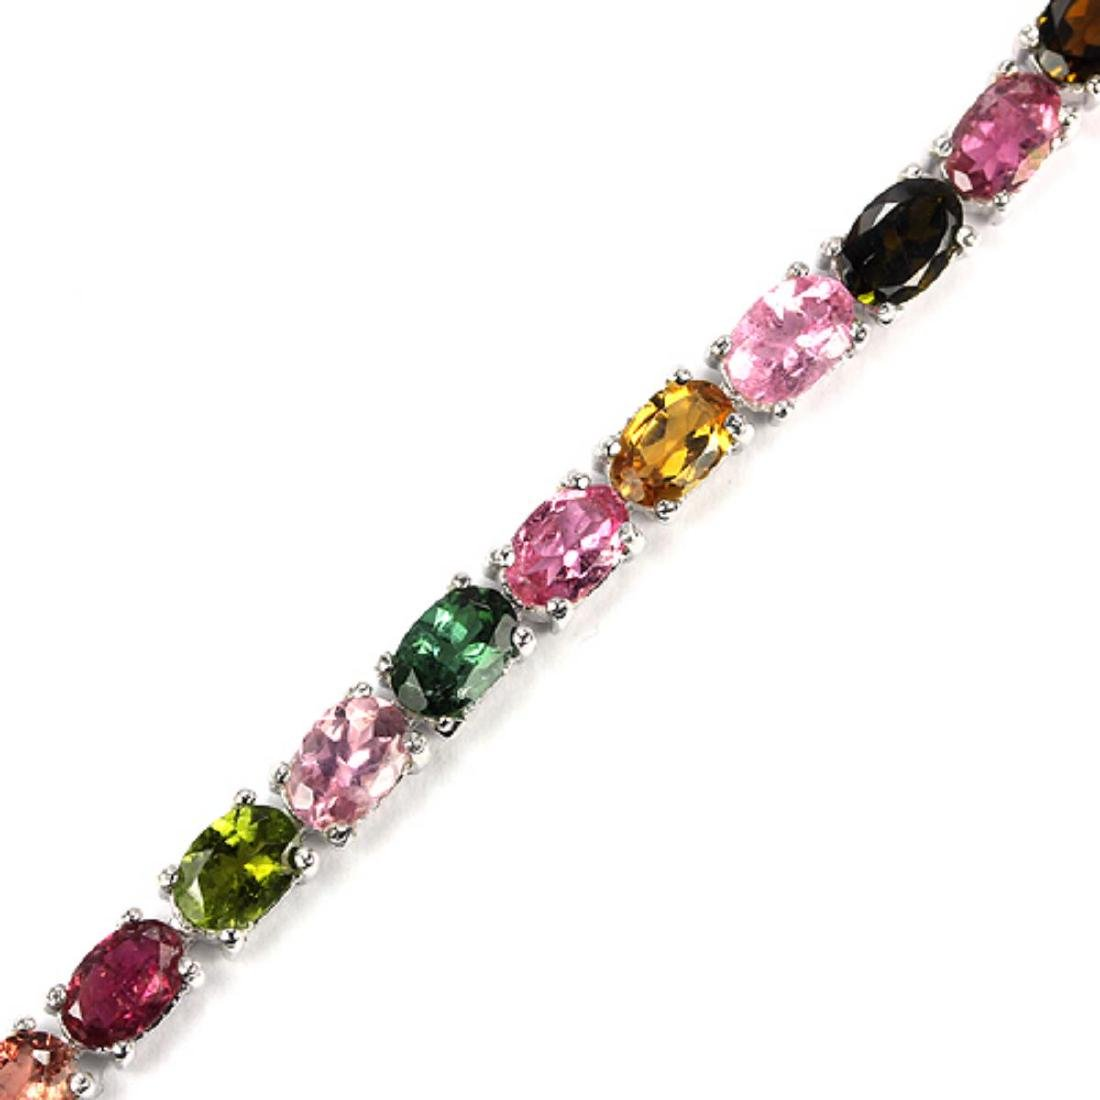 Natural Fancy Color Tourmaline Bracelet - 2